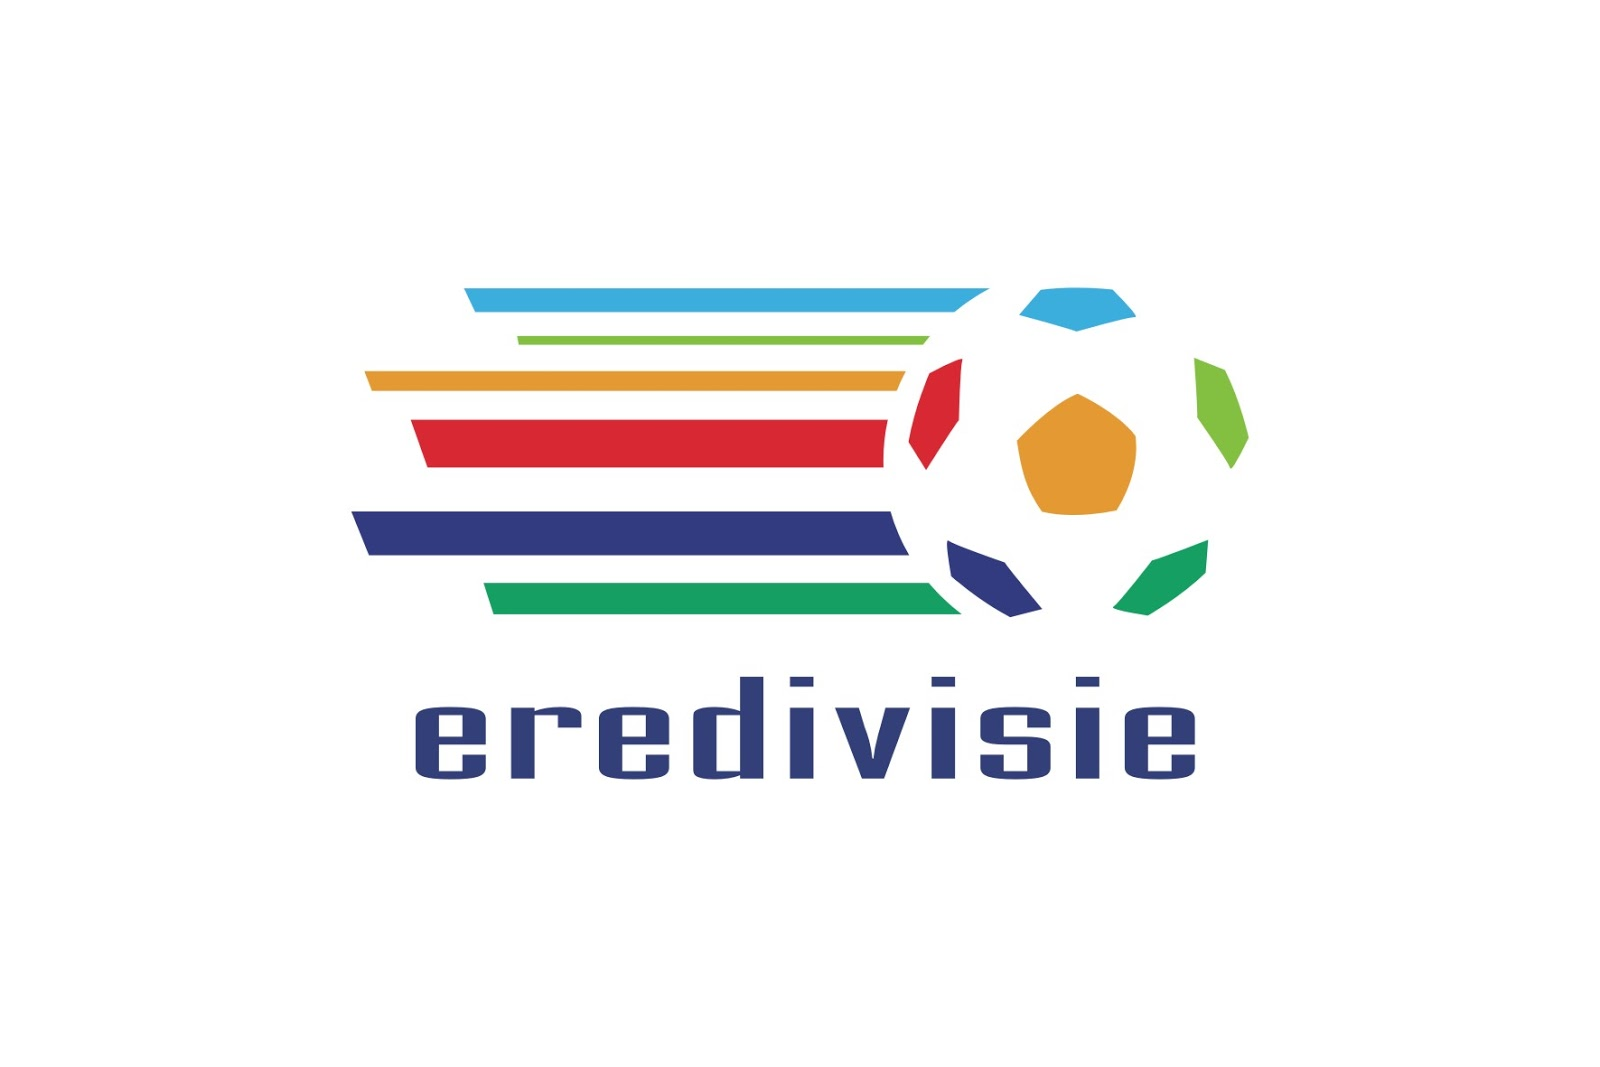 Holanda eredivisie